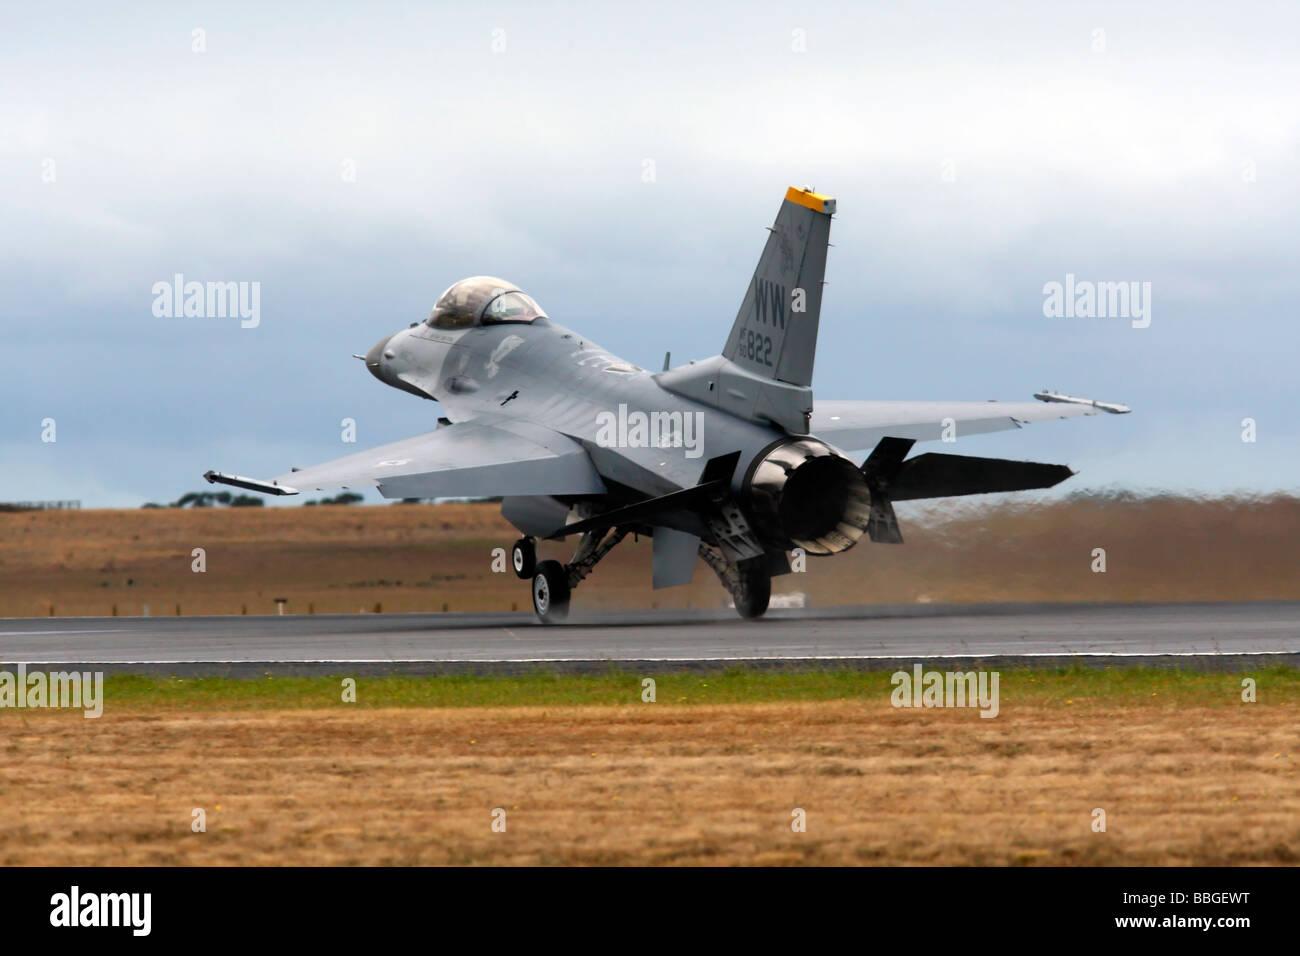 F 16 Fighting Falcon Landing - Stock Image